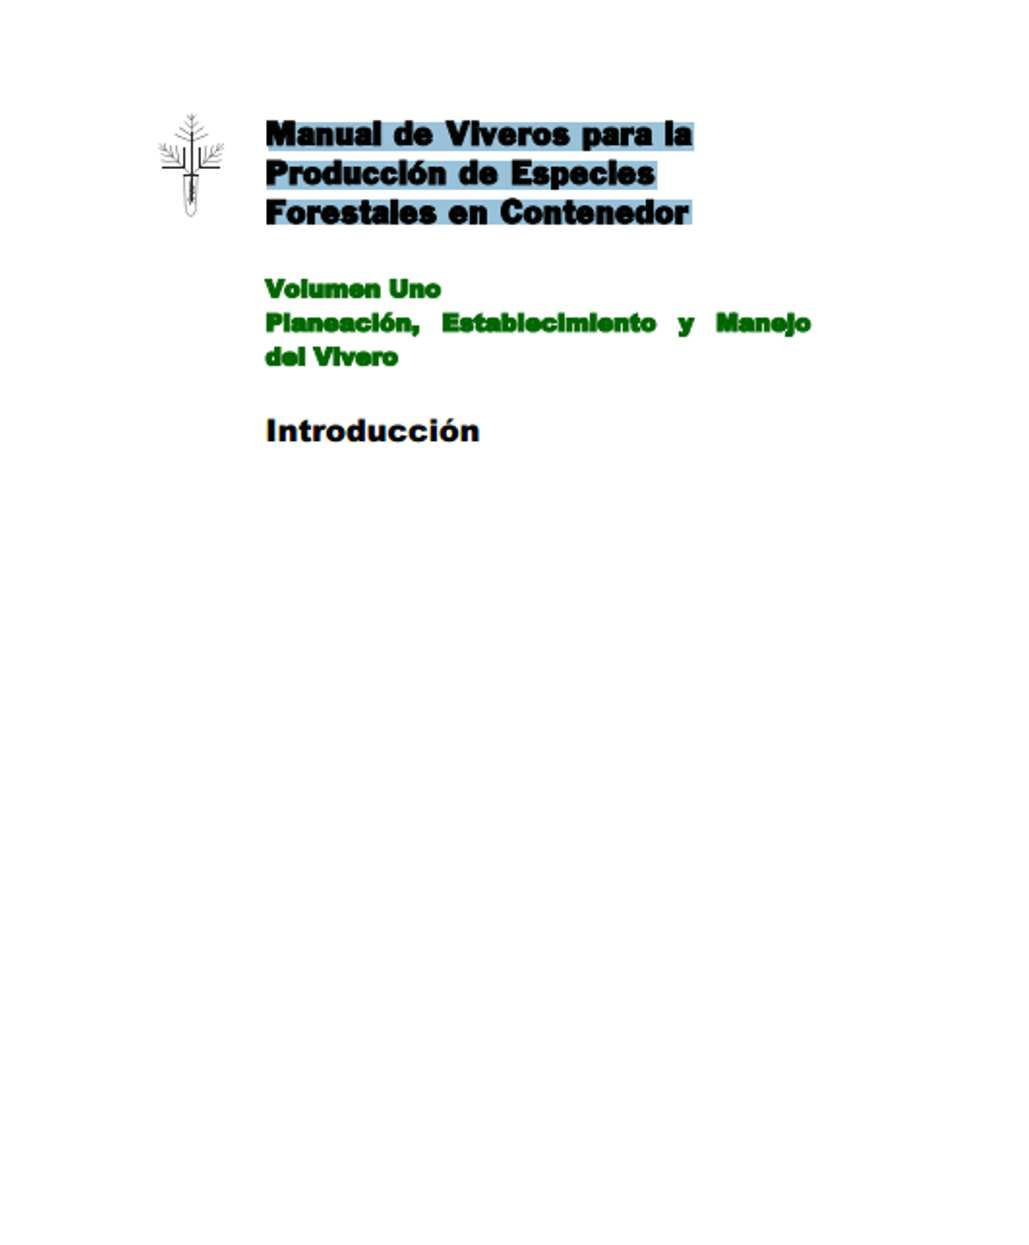 ingenieria forestal documento manual de viveros para la